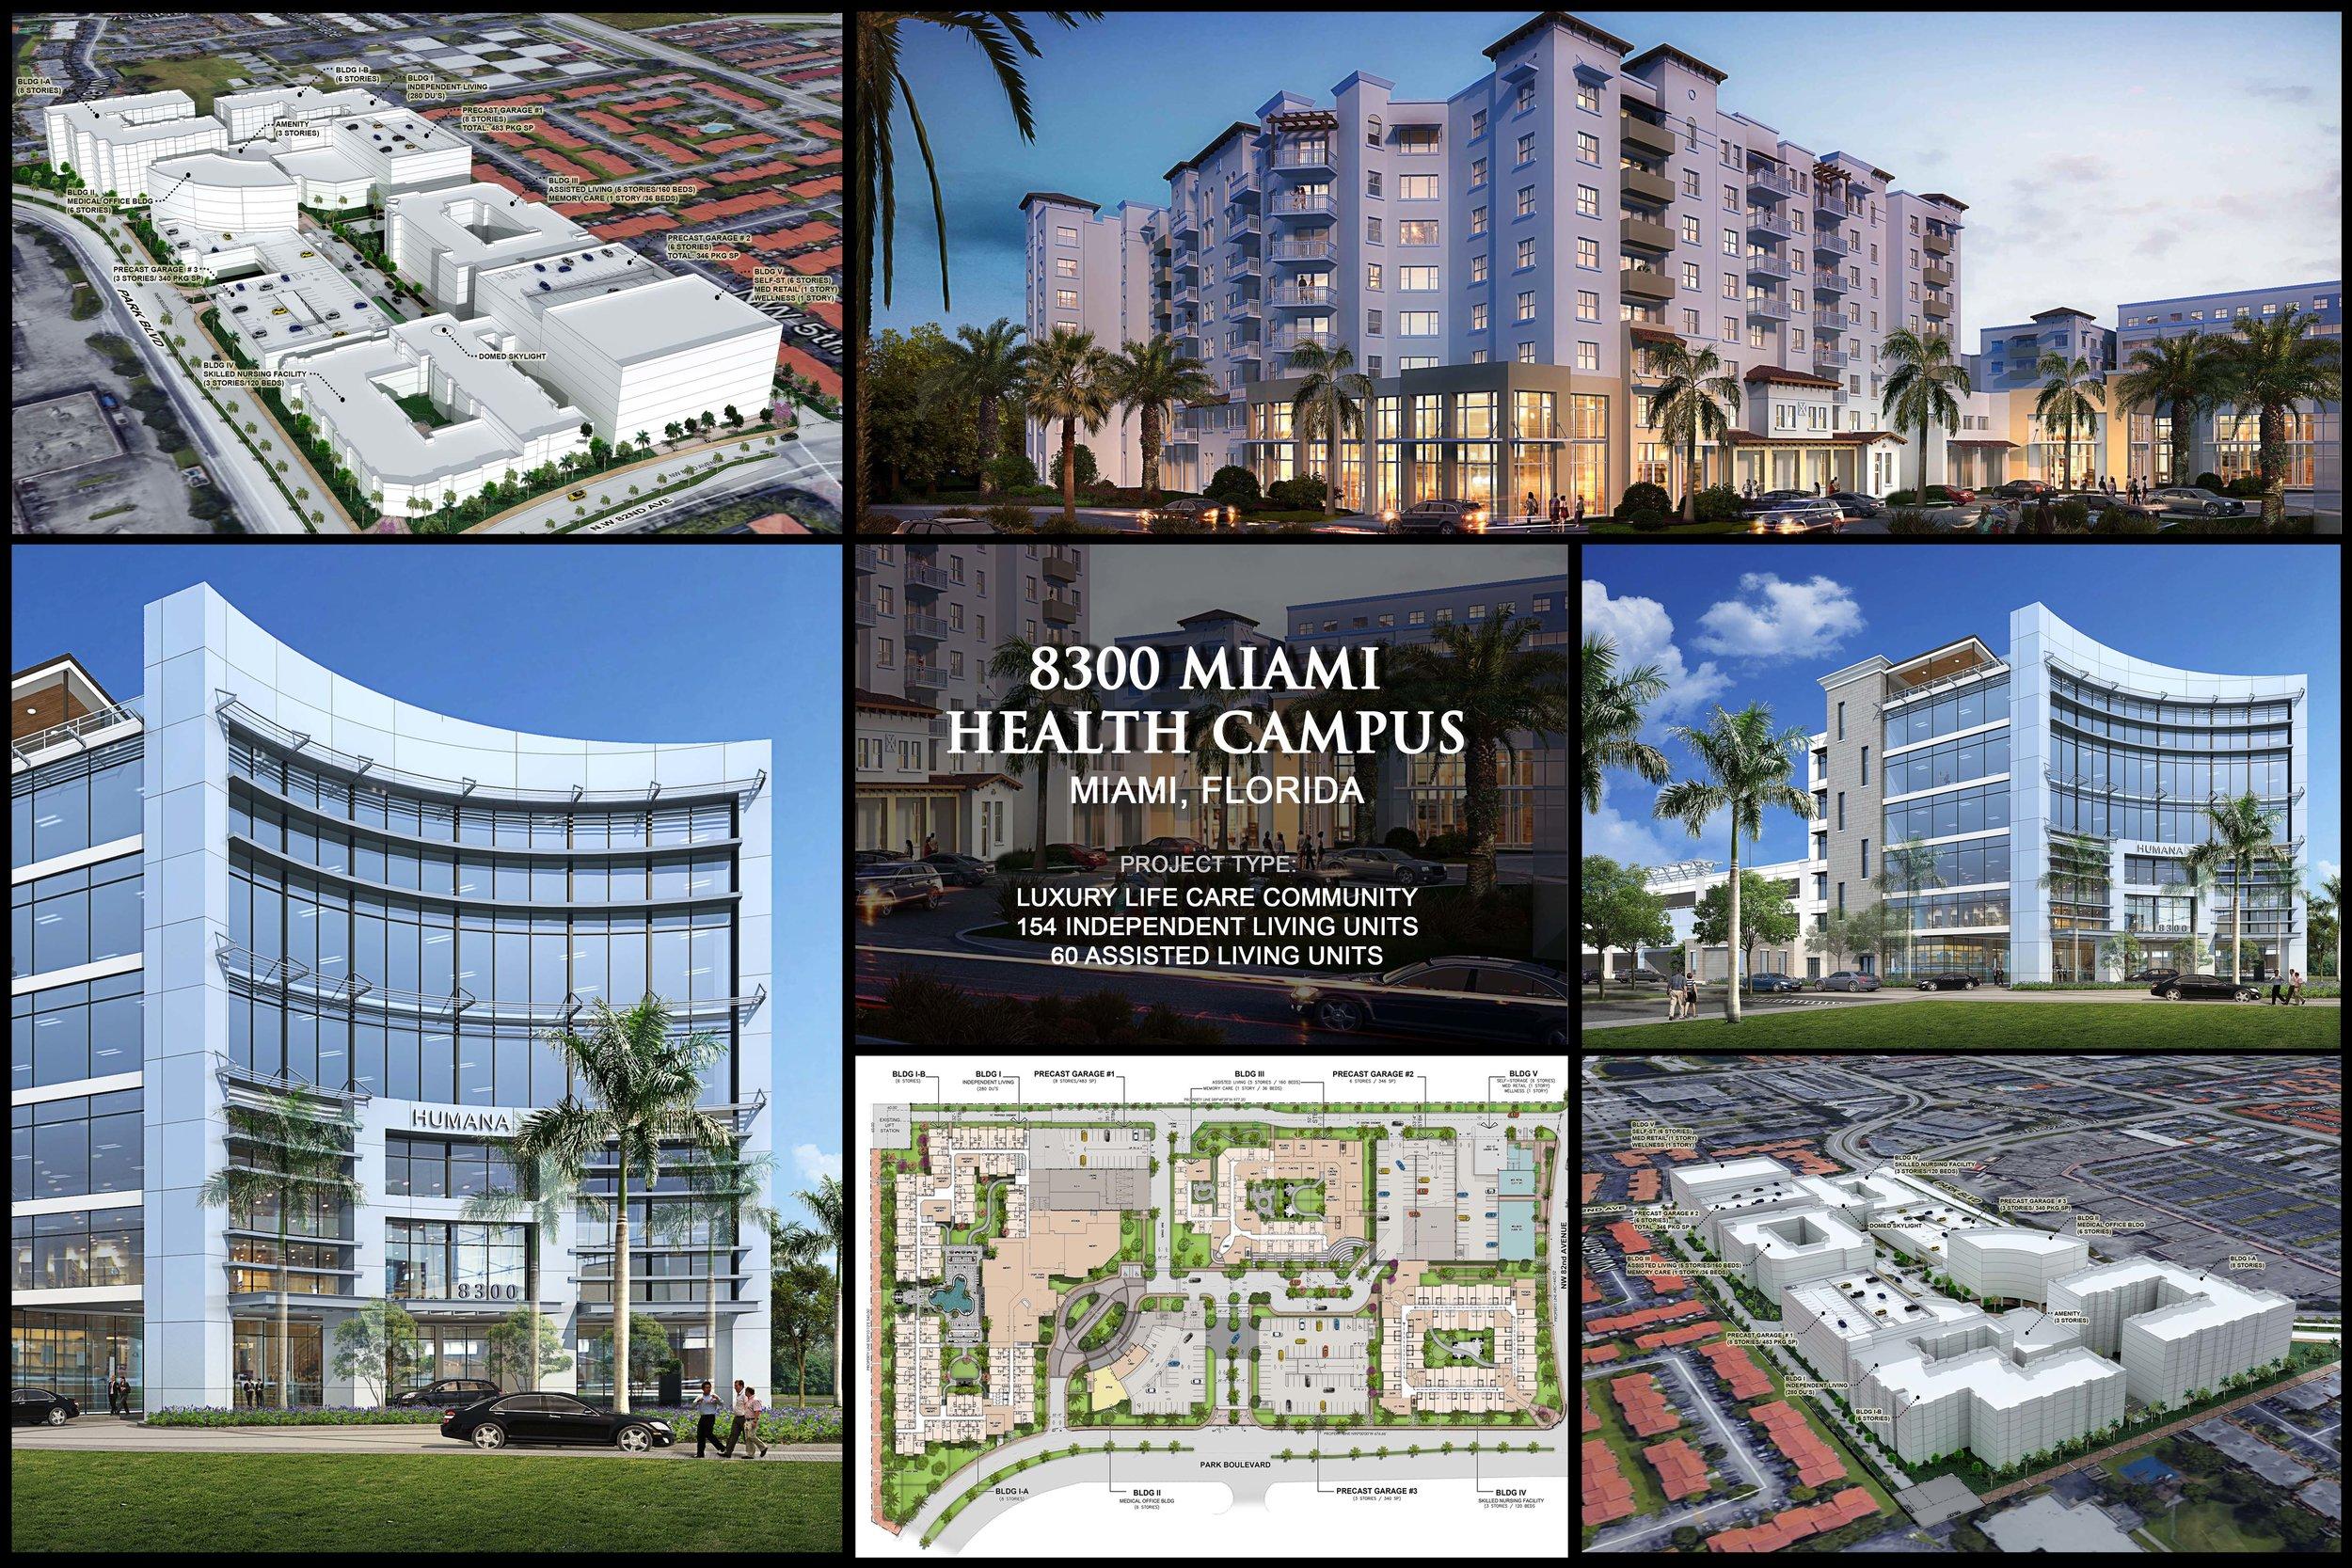 8300 Miami Health Campus